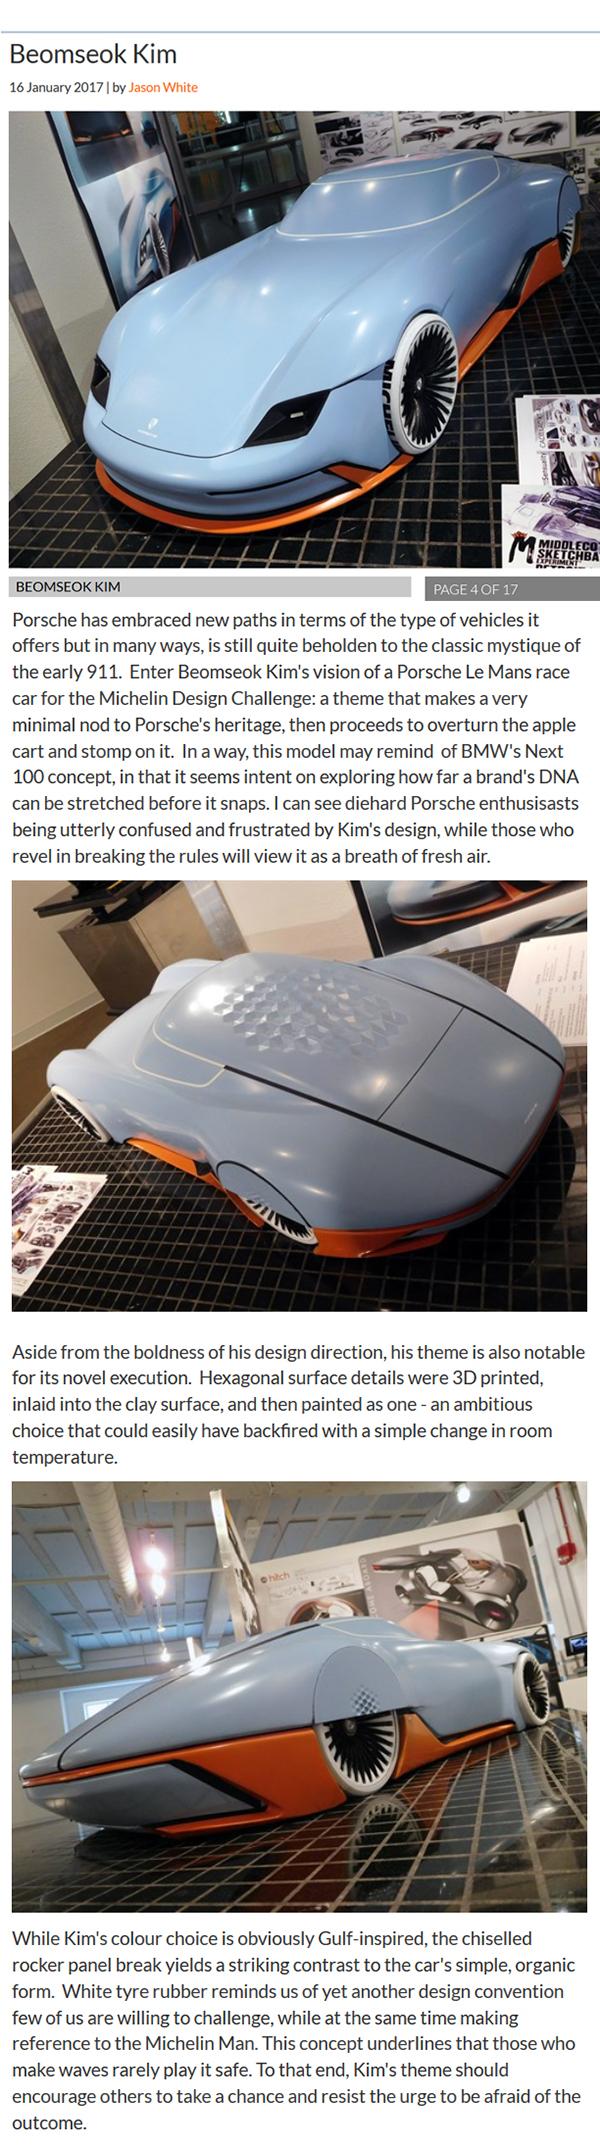 Porsche 999 car design news article on ccs portfolios for Industrial design news